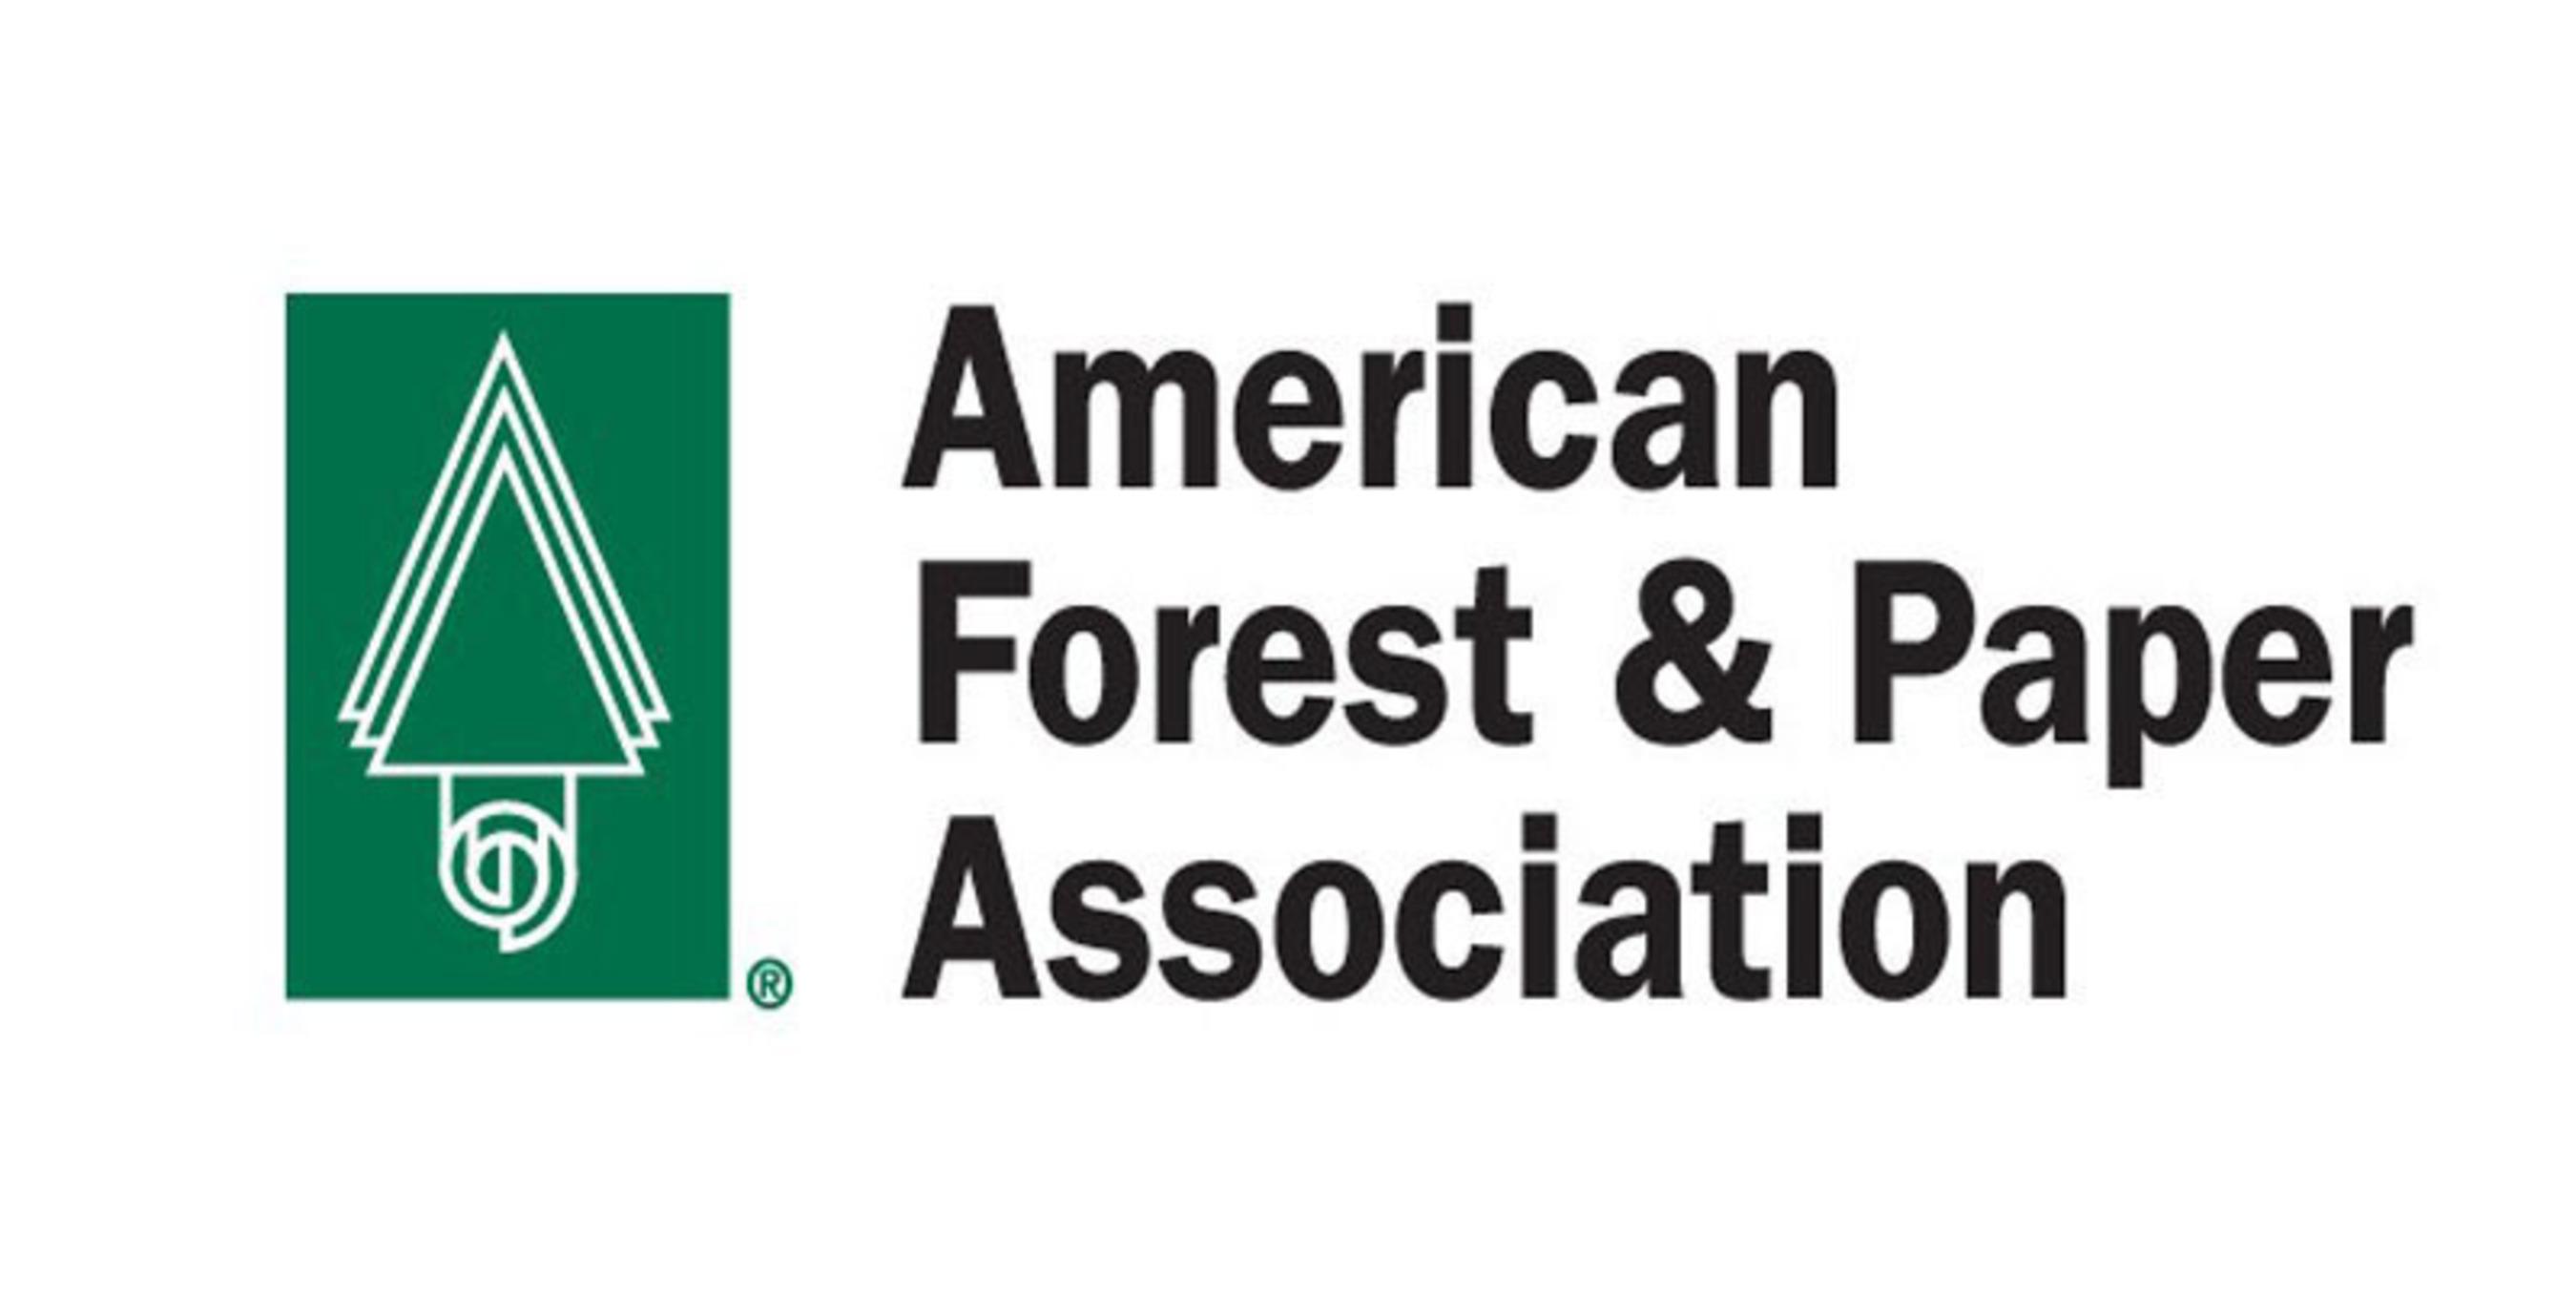 American Forest & Paper Association Logo